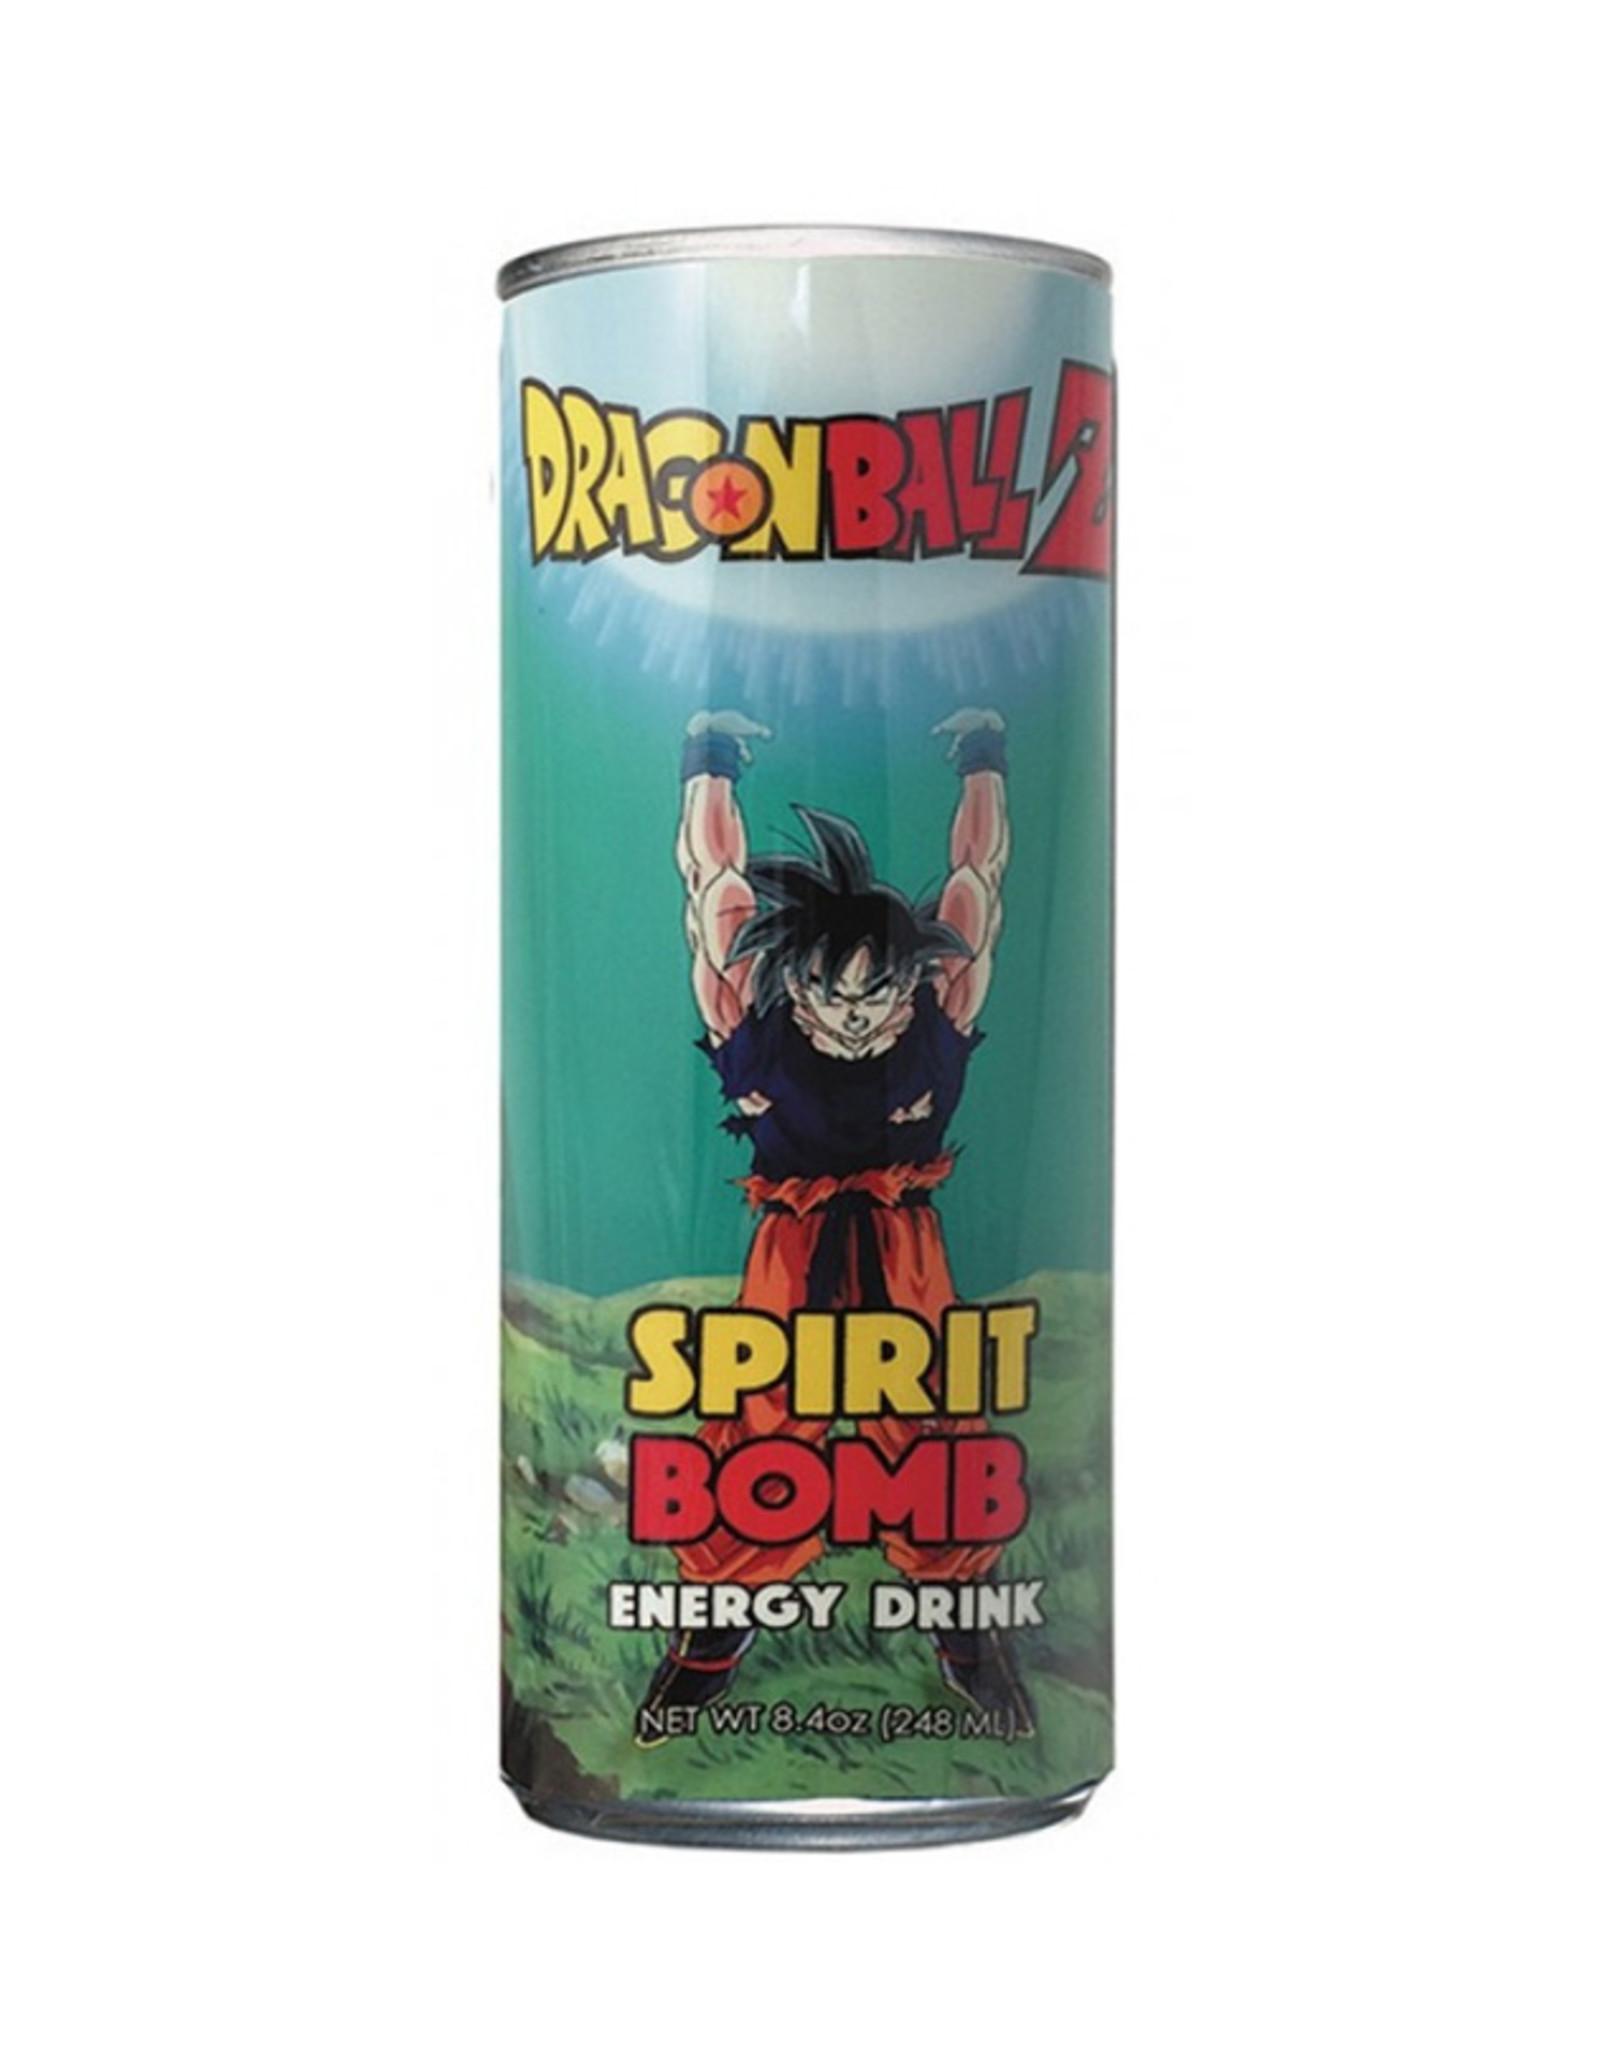 Dragon Ball Z Spirit Bomb Energy Drink